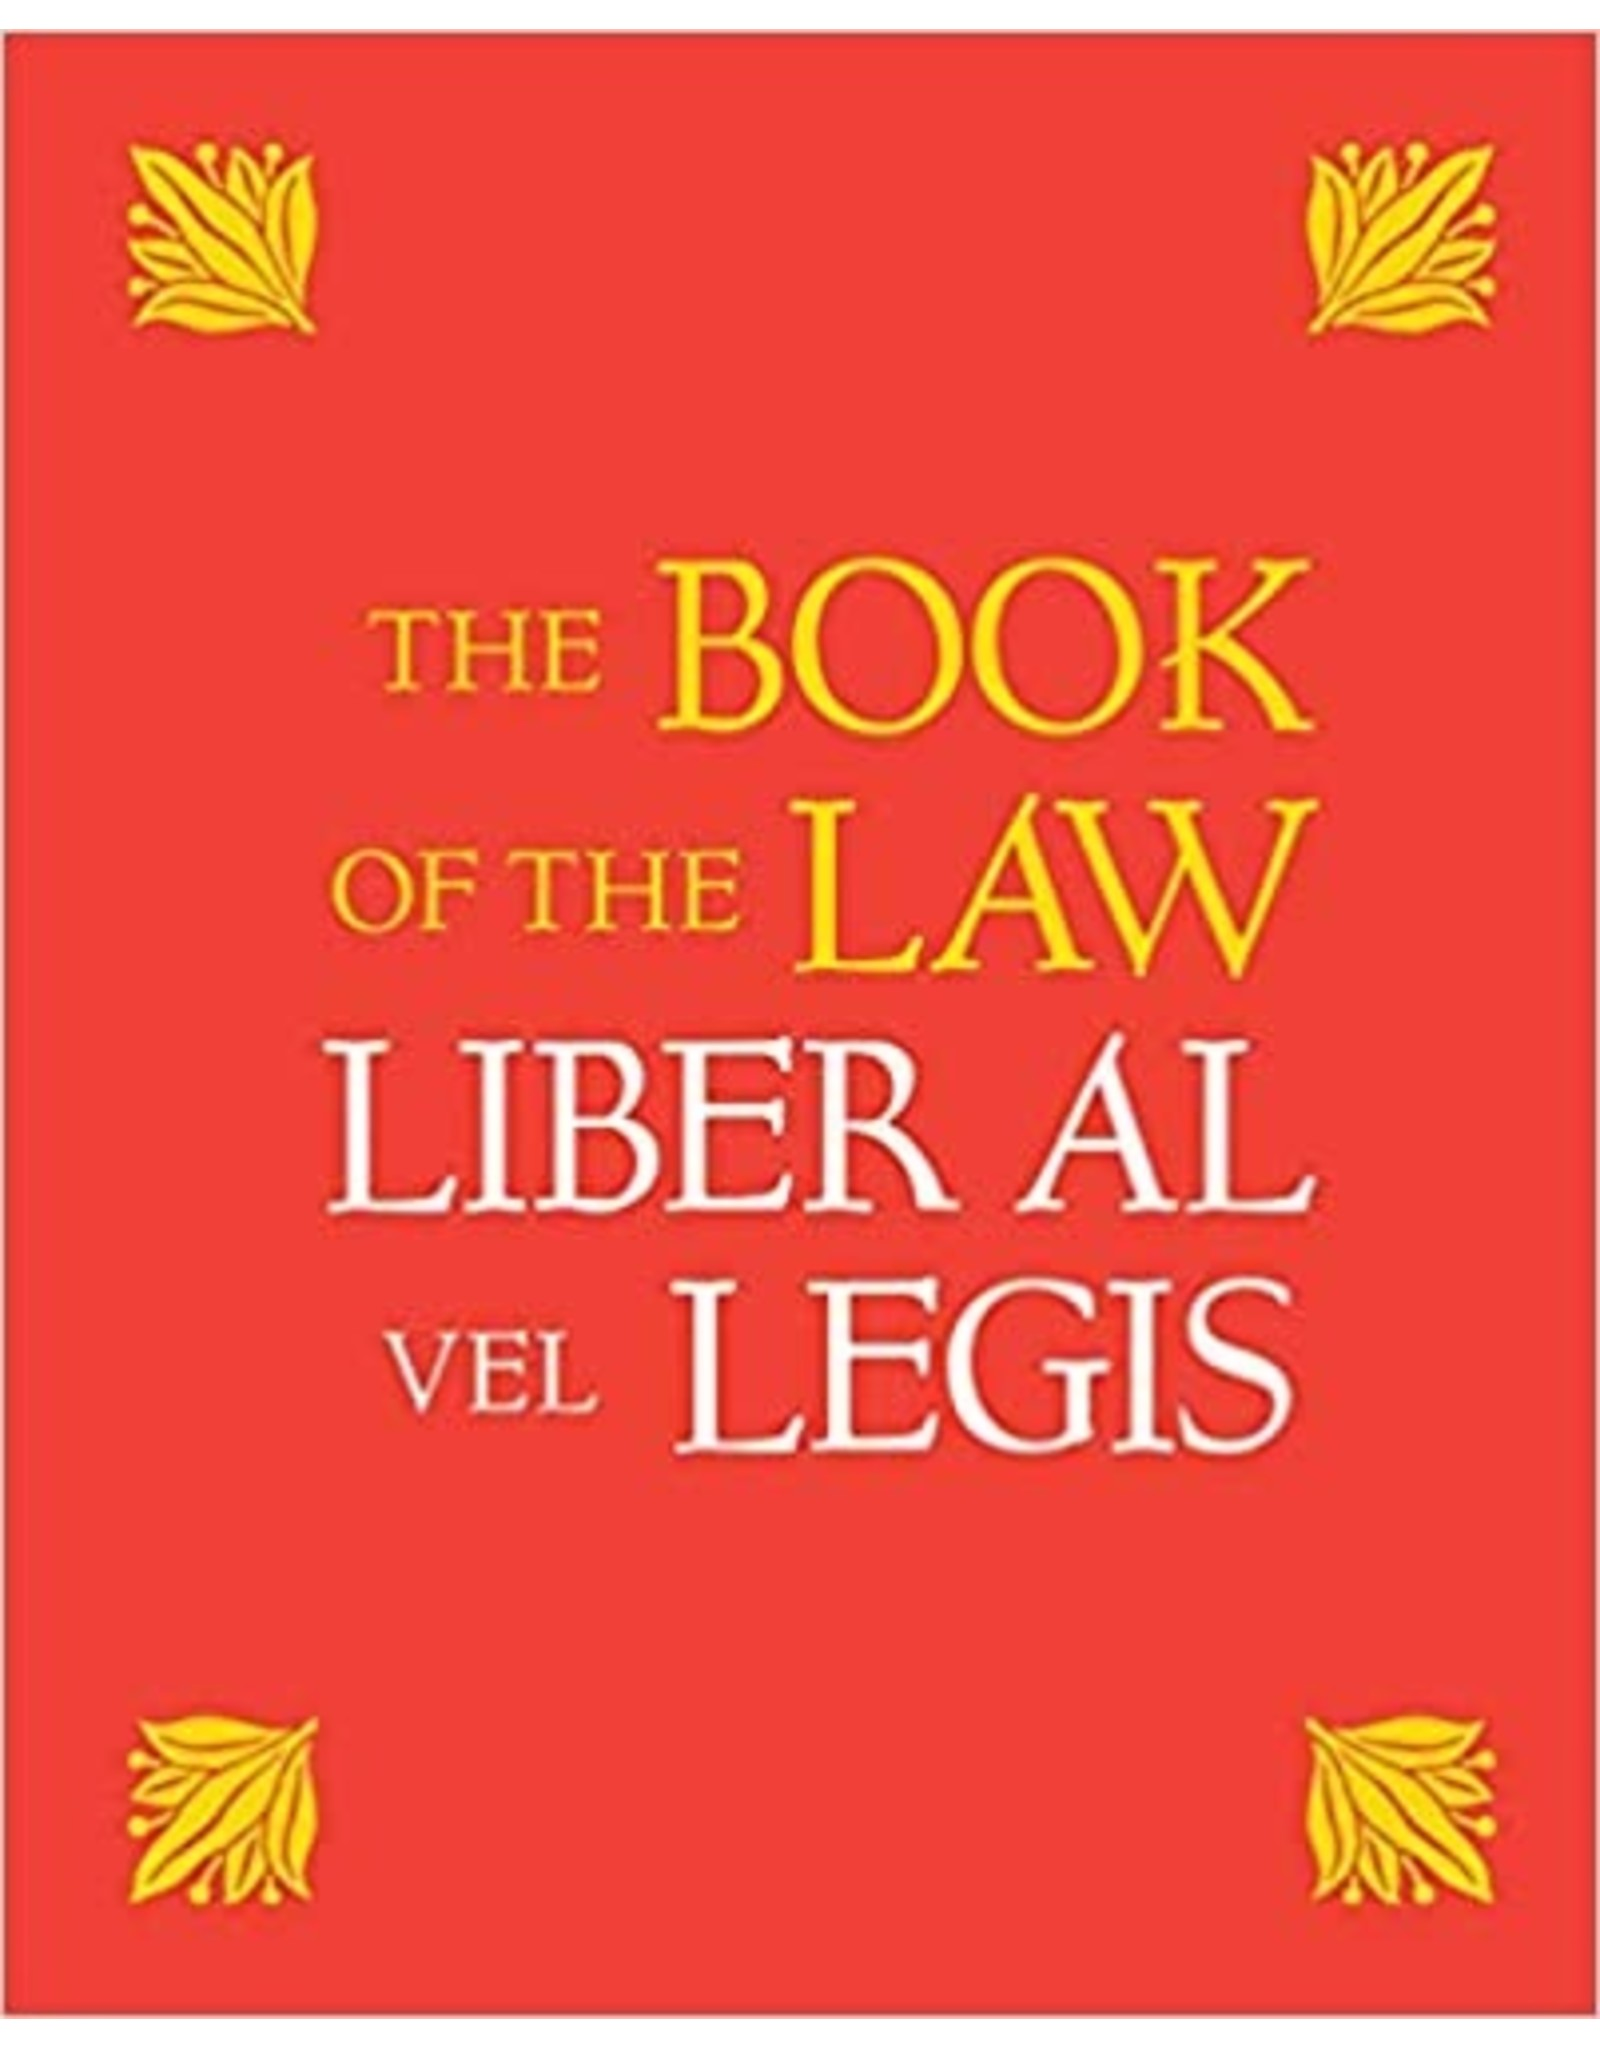 The Book of the Law: Liber AL VEL LEGIS